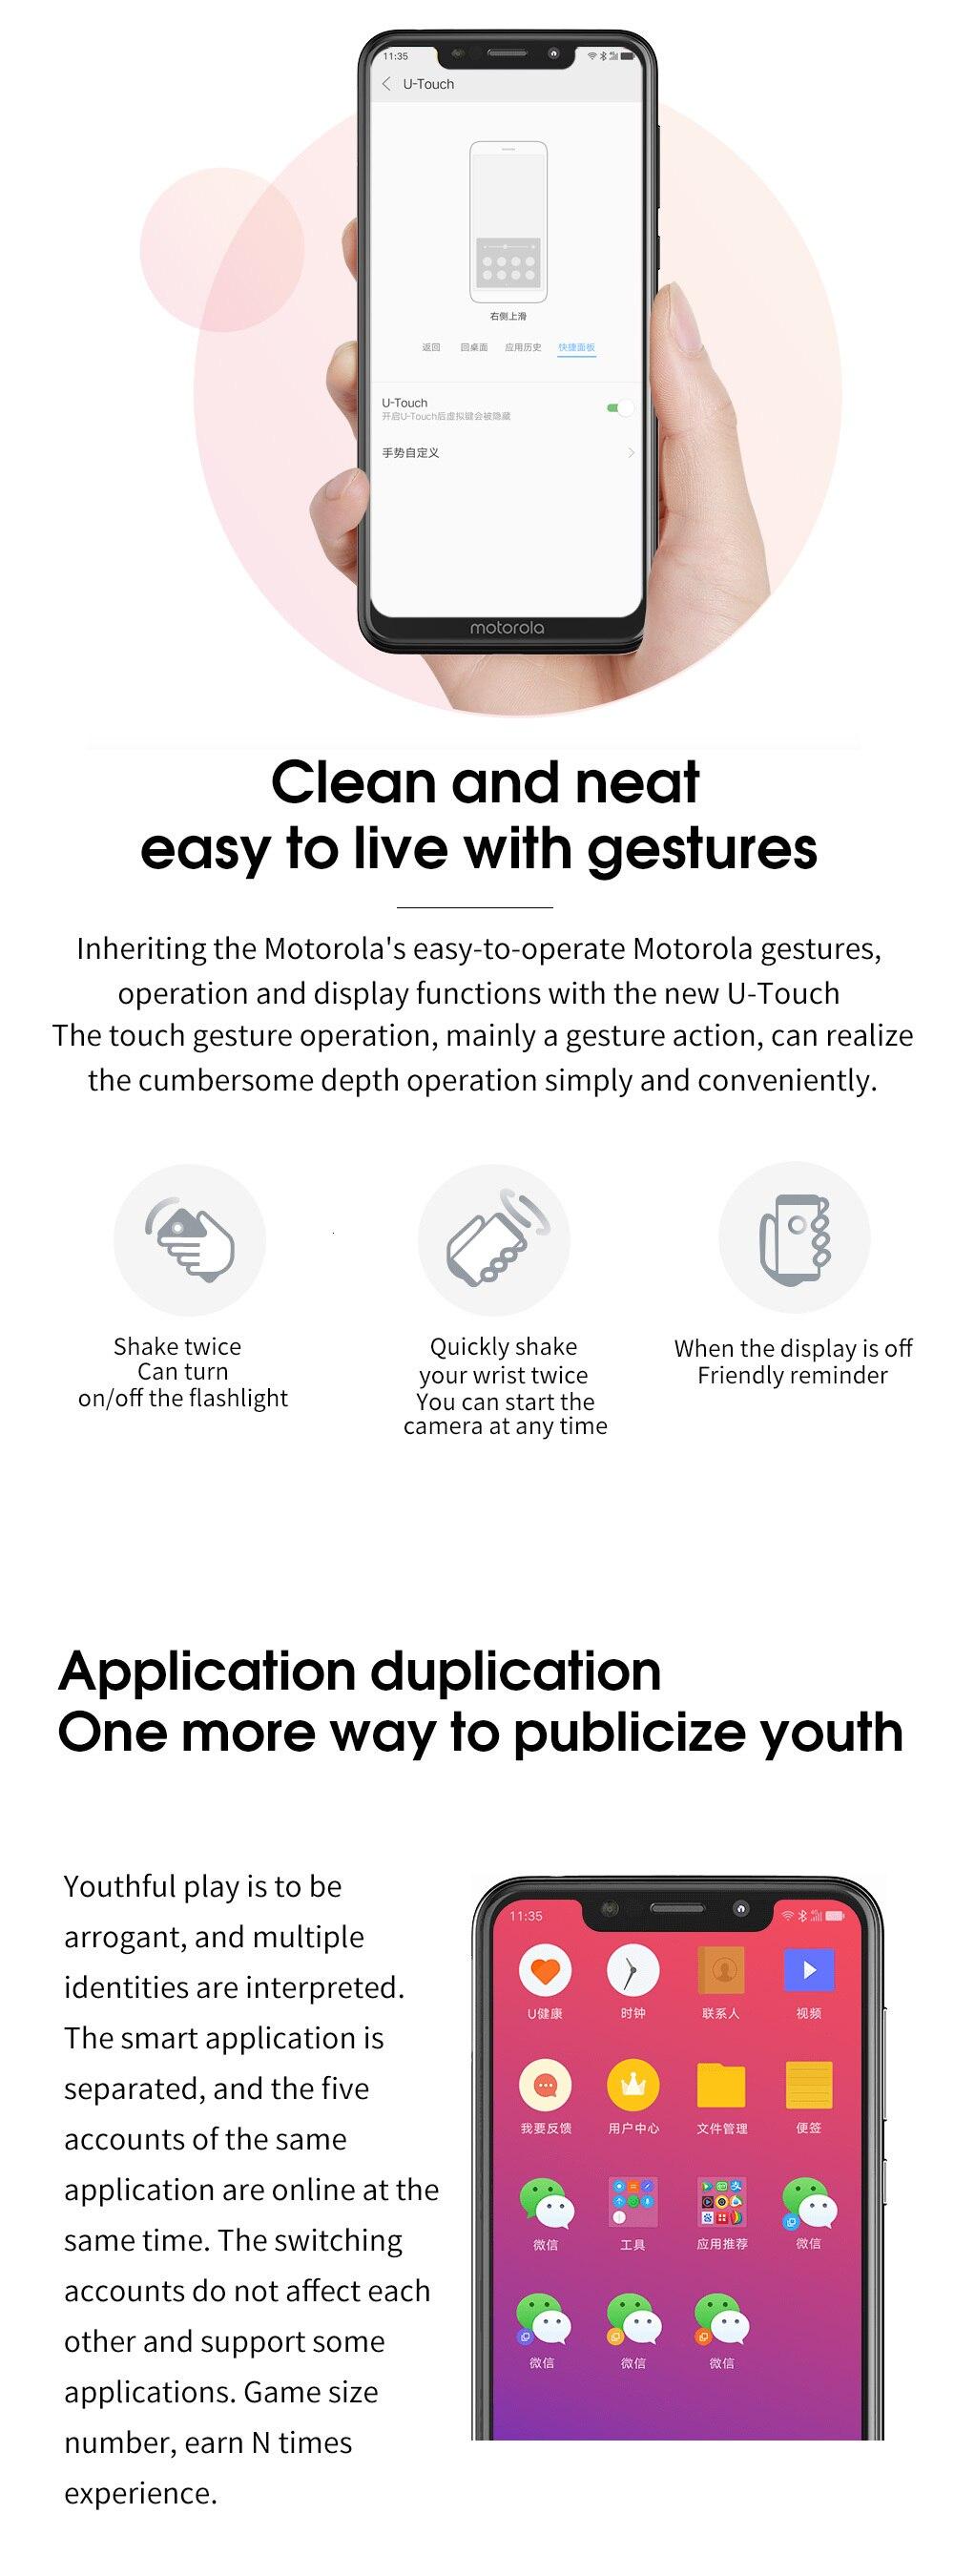 H336c03d63cfc43ec8b674b5be555a22f1 Moto One Mobile Phone 4GB 64GB AI Camera Smartphone 2.5D Double-sided Glass Body Octa Core Phone Support Face Fingerprint Unlock